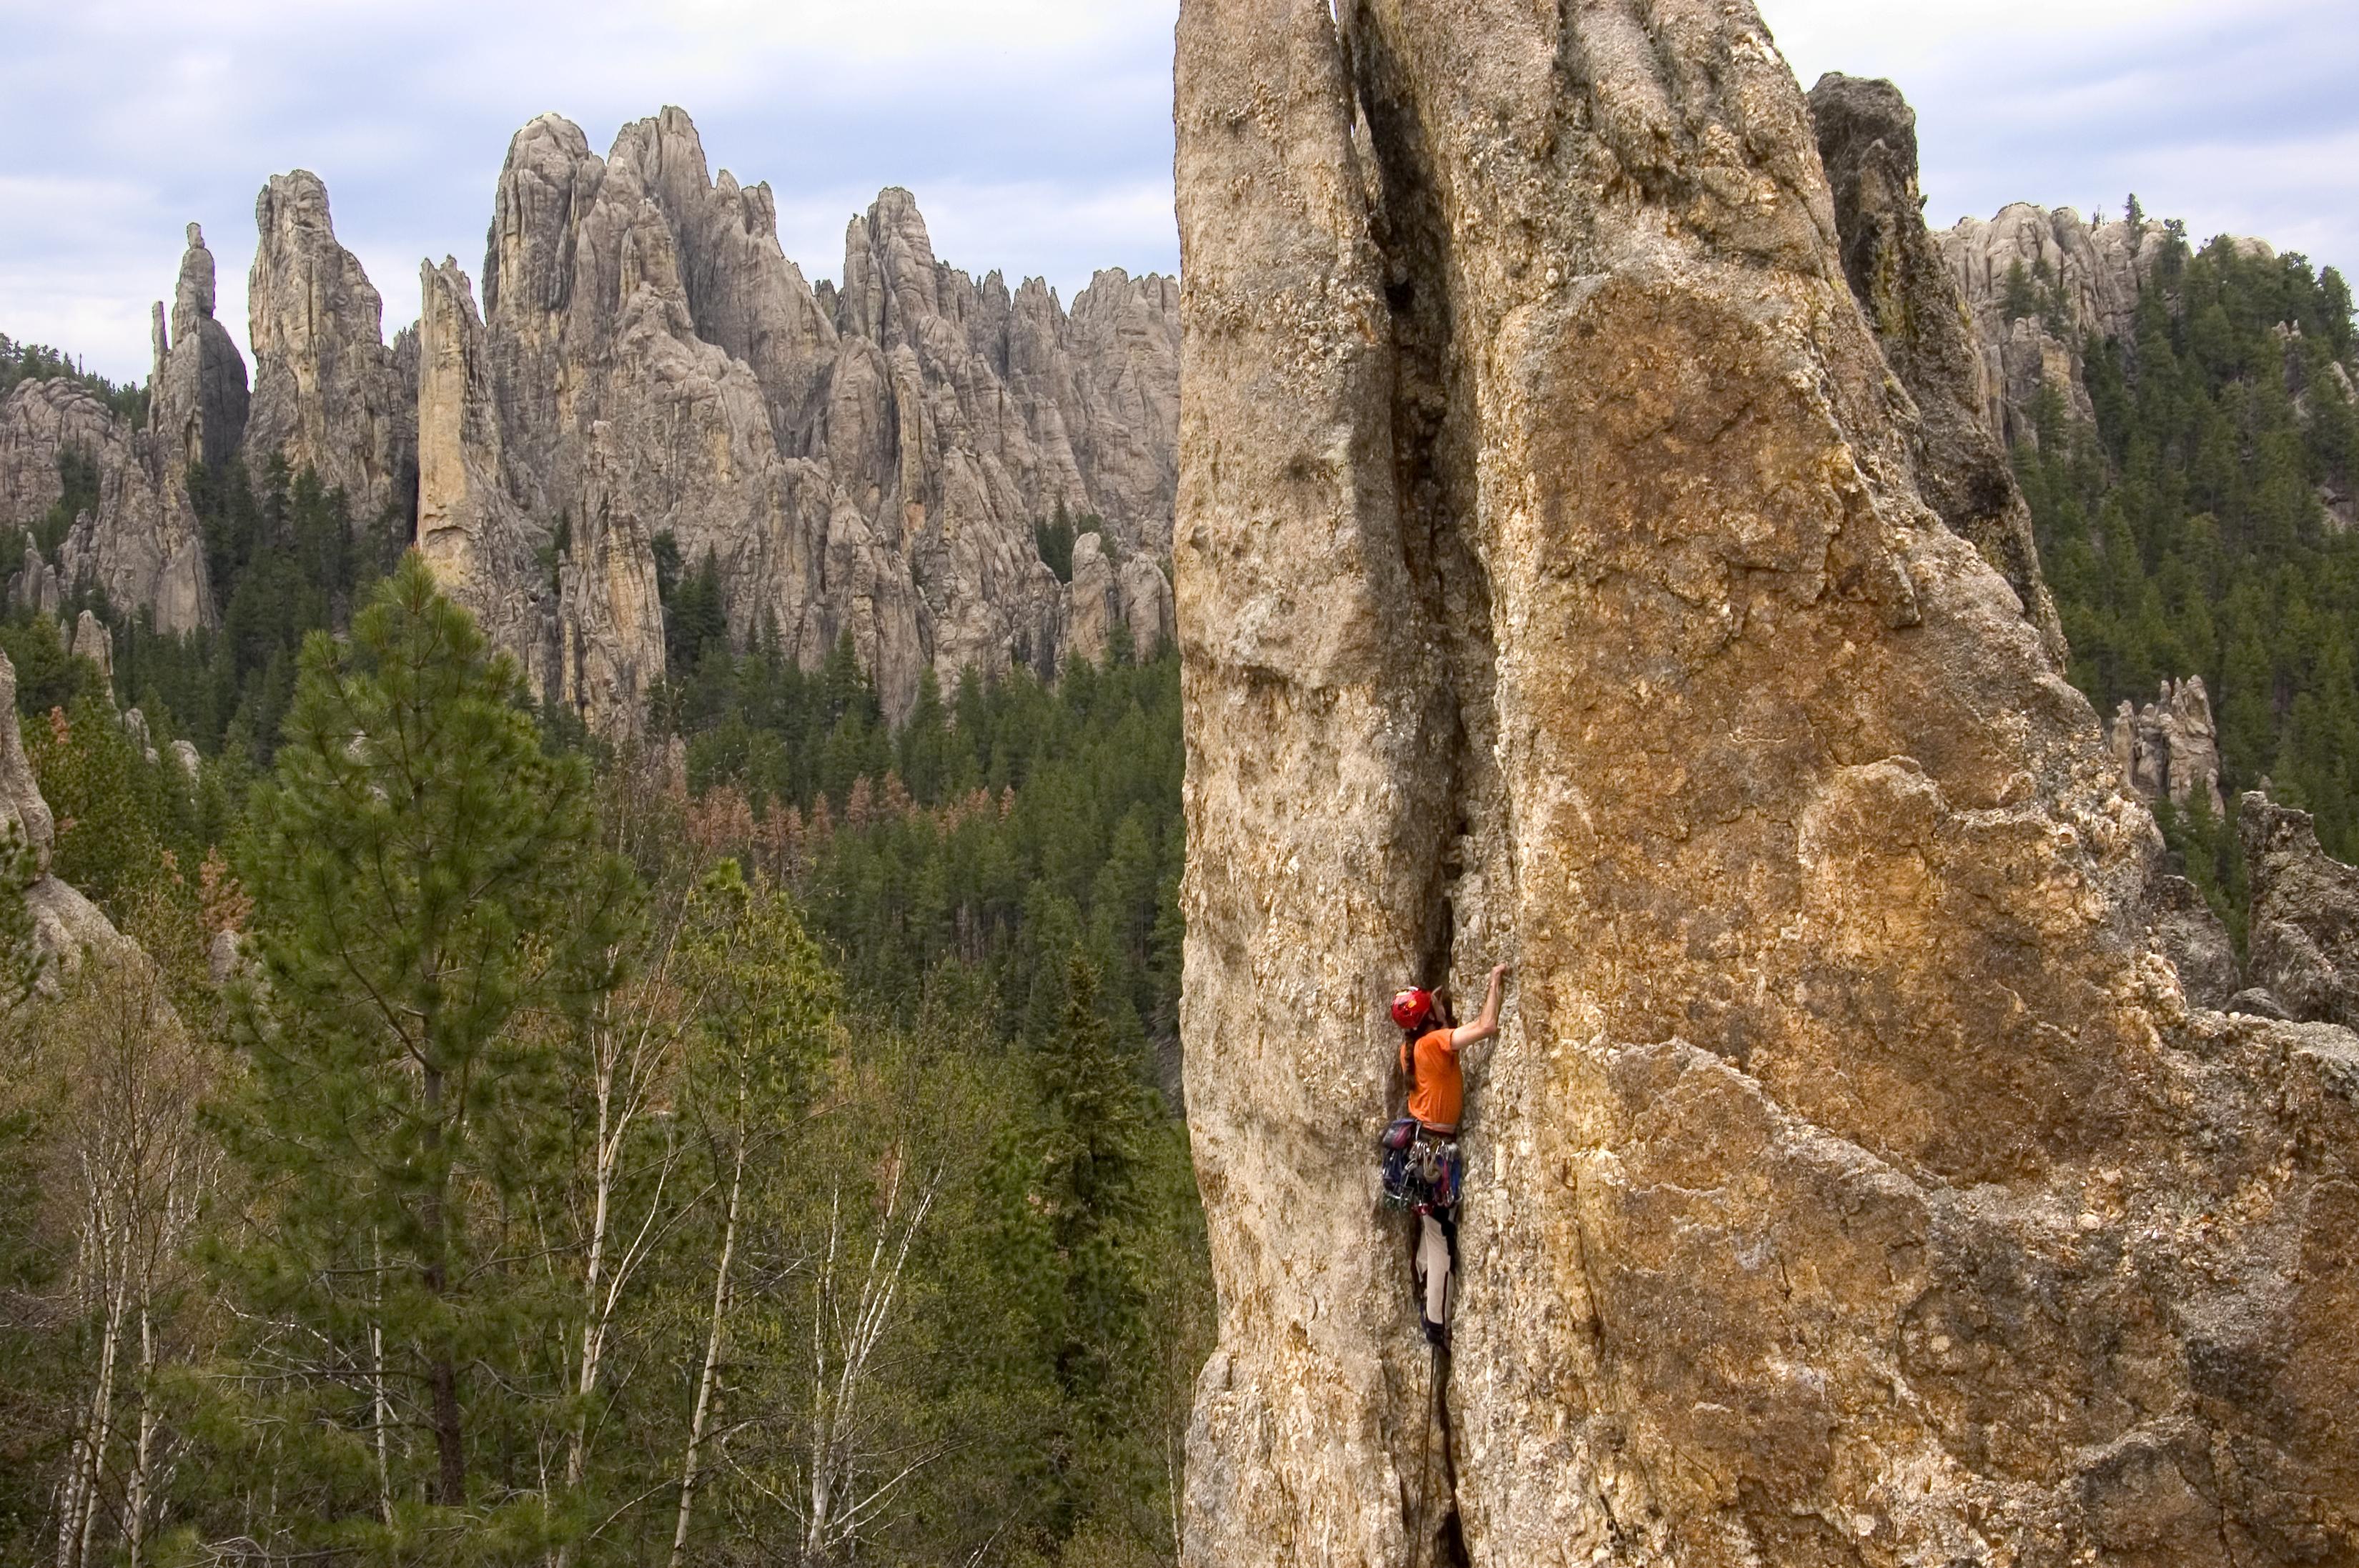 Sylvan Rocks Climbing Amp Guide Service Black Hills